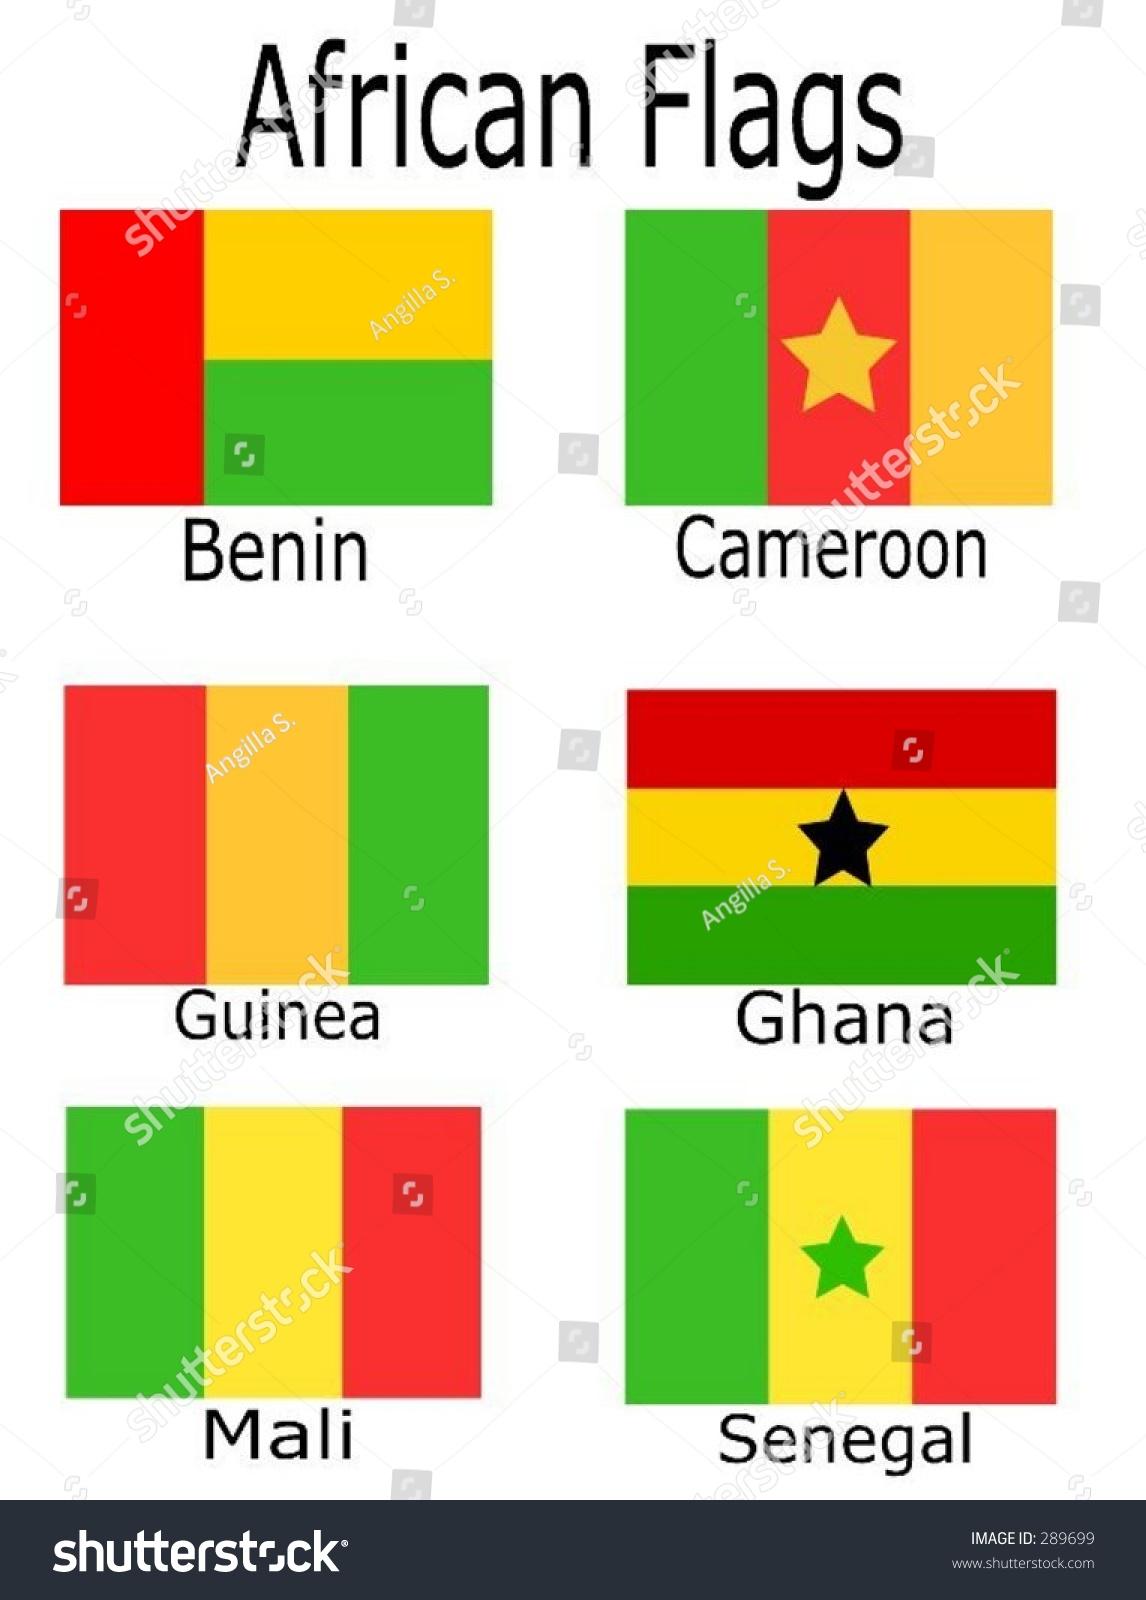 stock-vector-african-flags-benin-cameroon-guinea-ghana-mali-and-senegal-289699.jpg